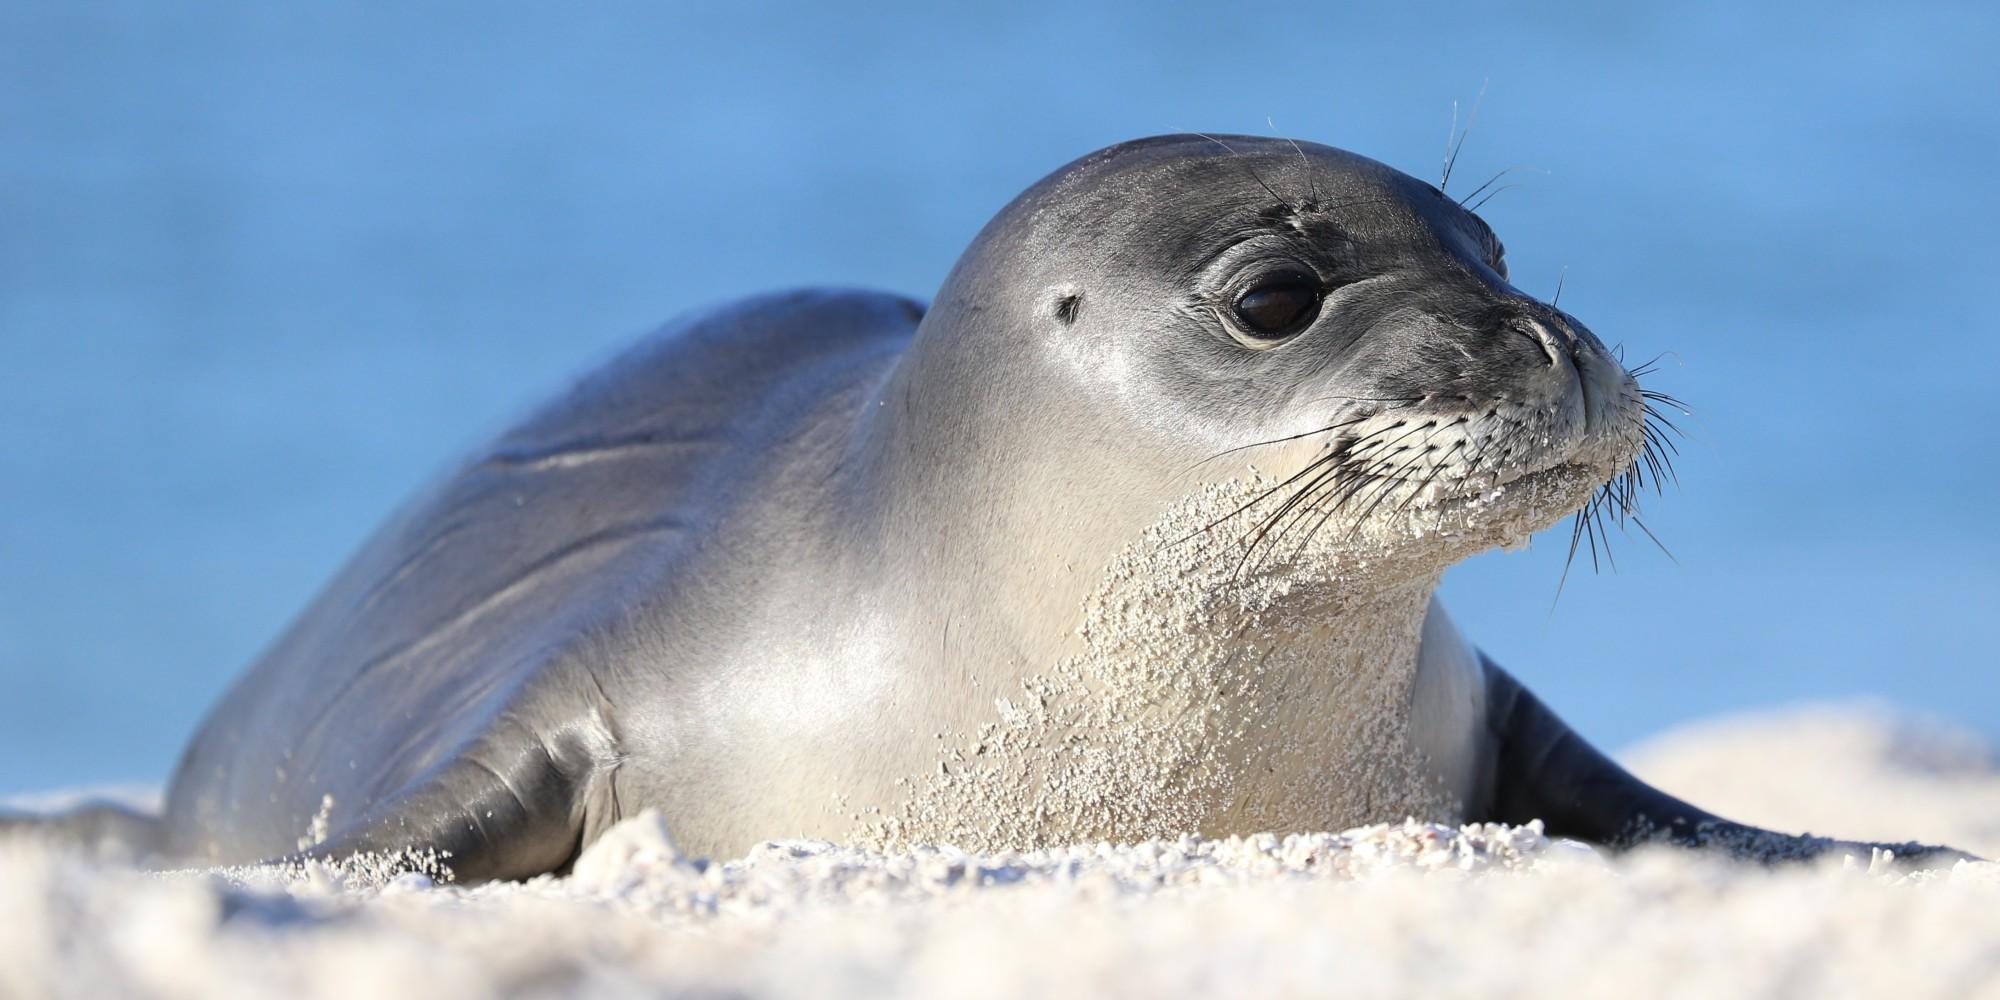 Endangered Hawaiian Monk Seals Making Very Cute Comeback